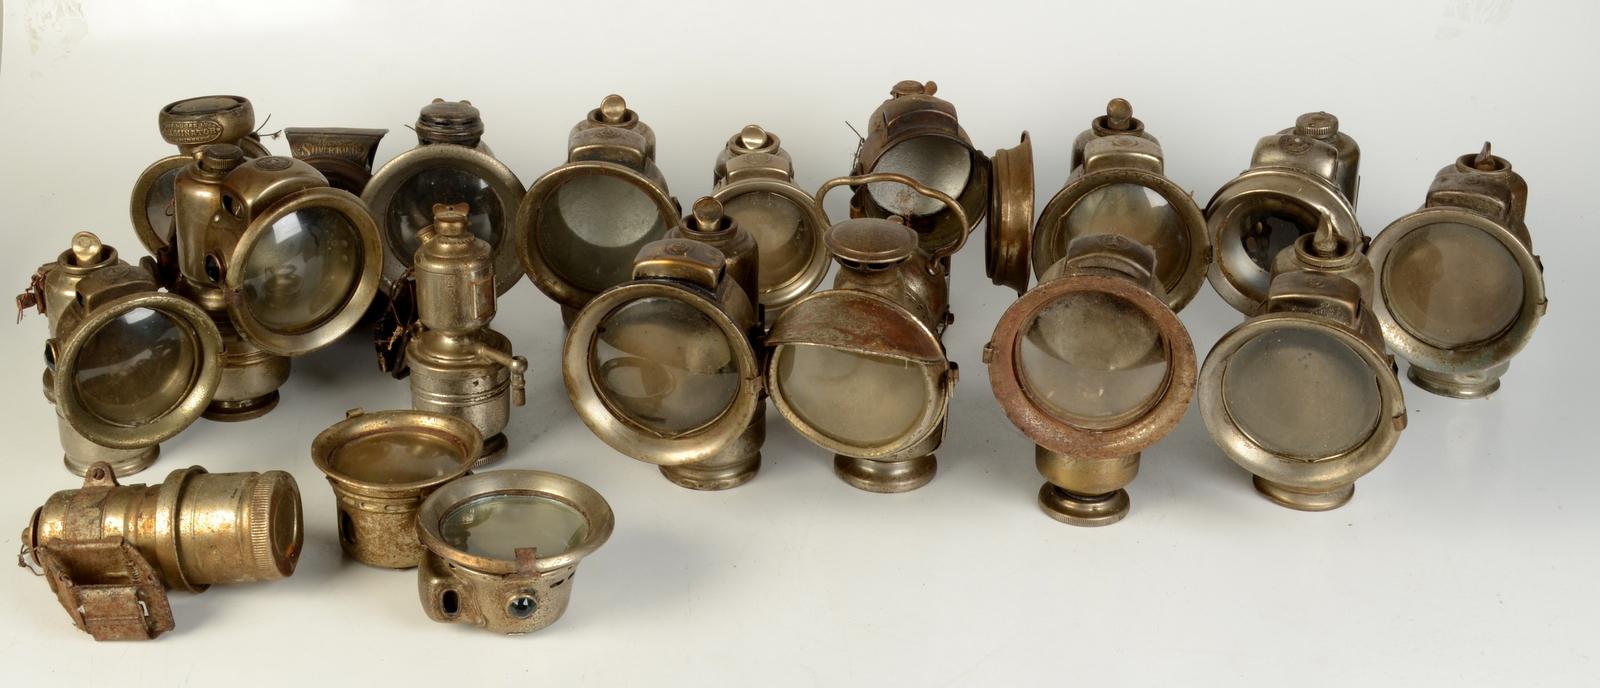 Lot 8 - A collection of seventeen carbide bicycle lamps, including a Lucas Silver King, a Lucas Luminator,